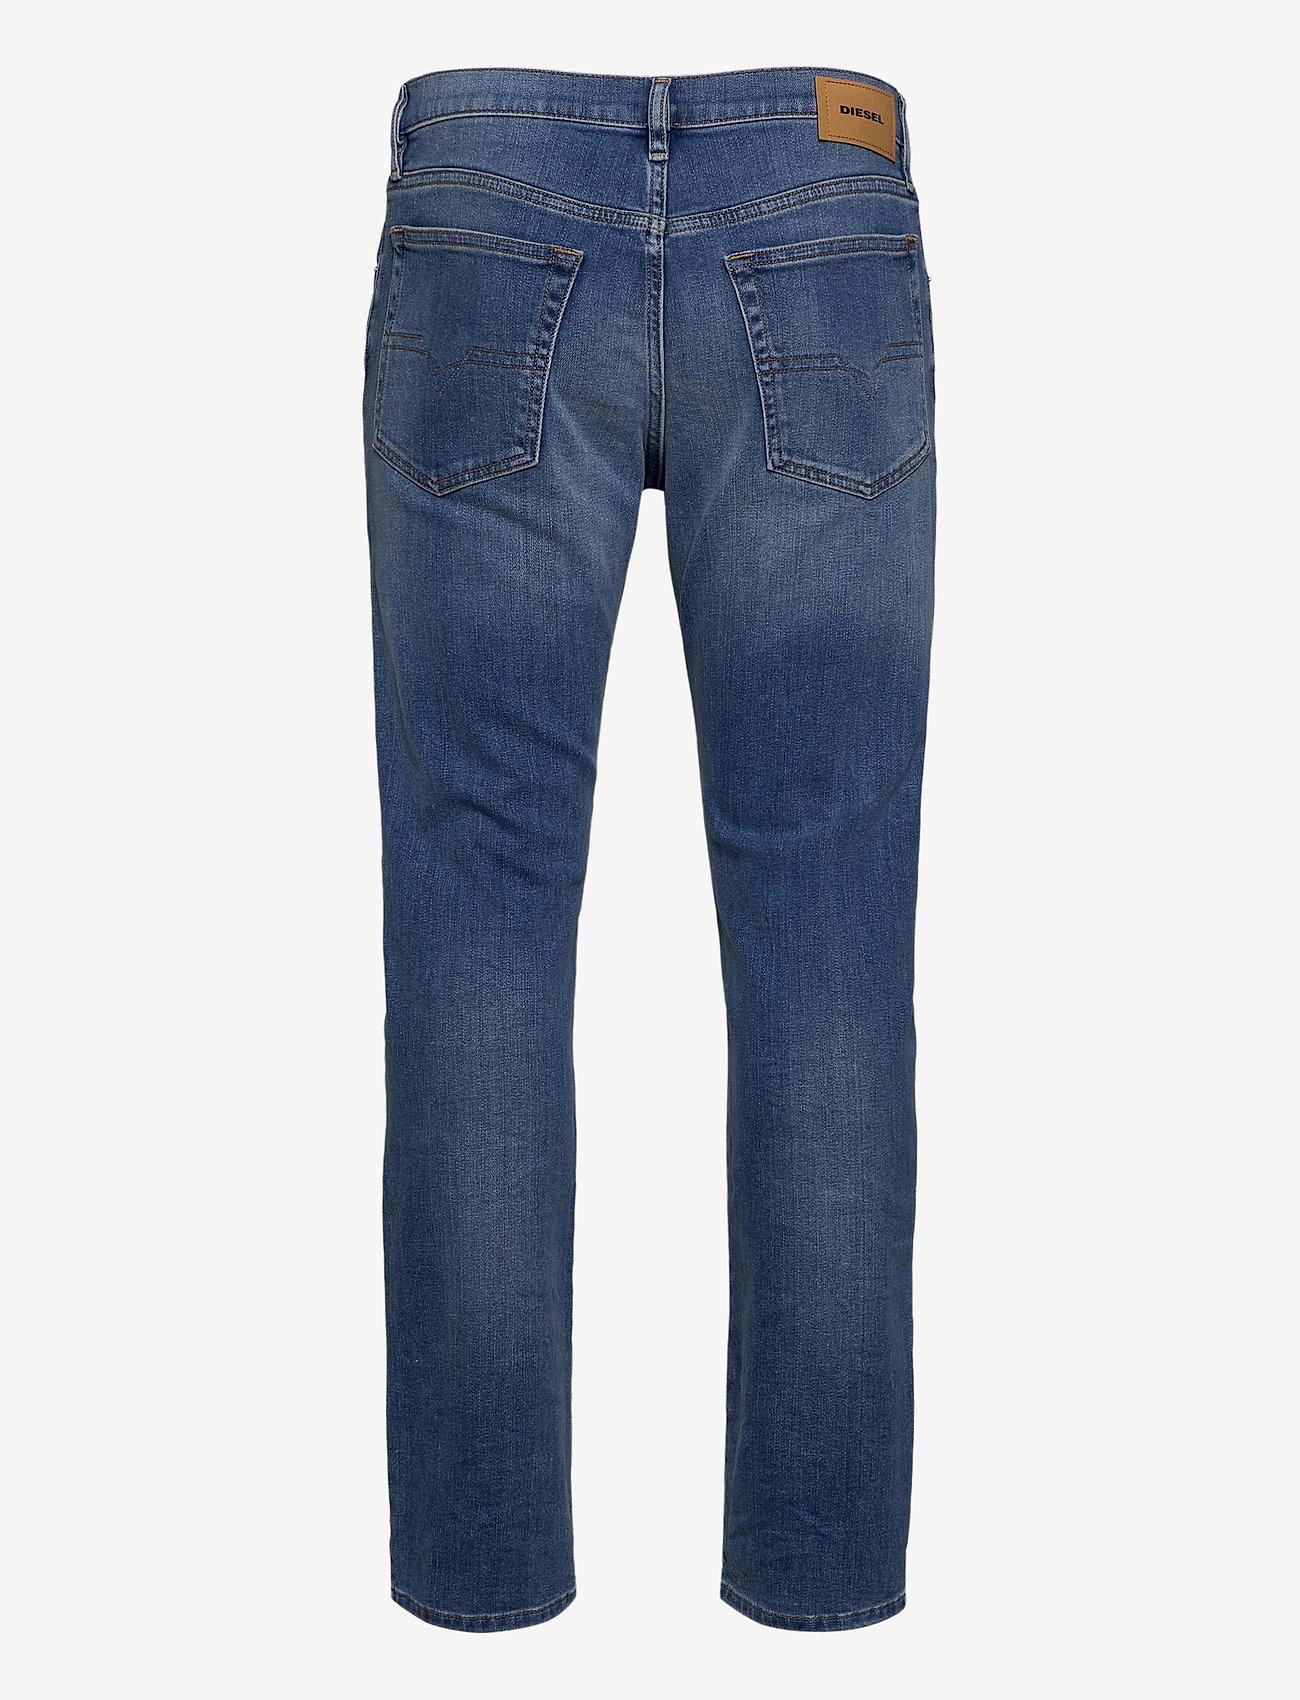 Diesel Men - D-MIHTRY L.30 TROUSERS - regular jeans - denim - 1